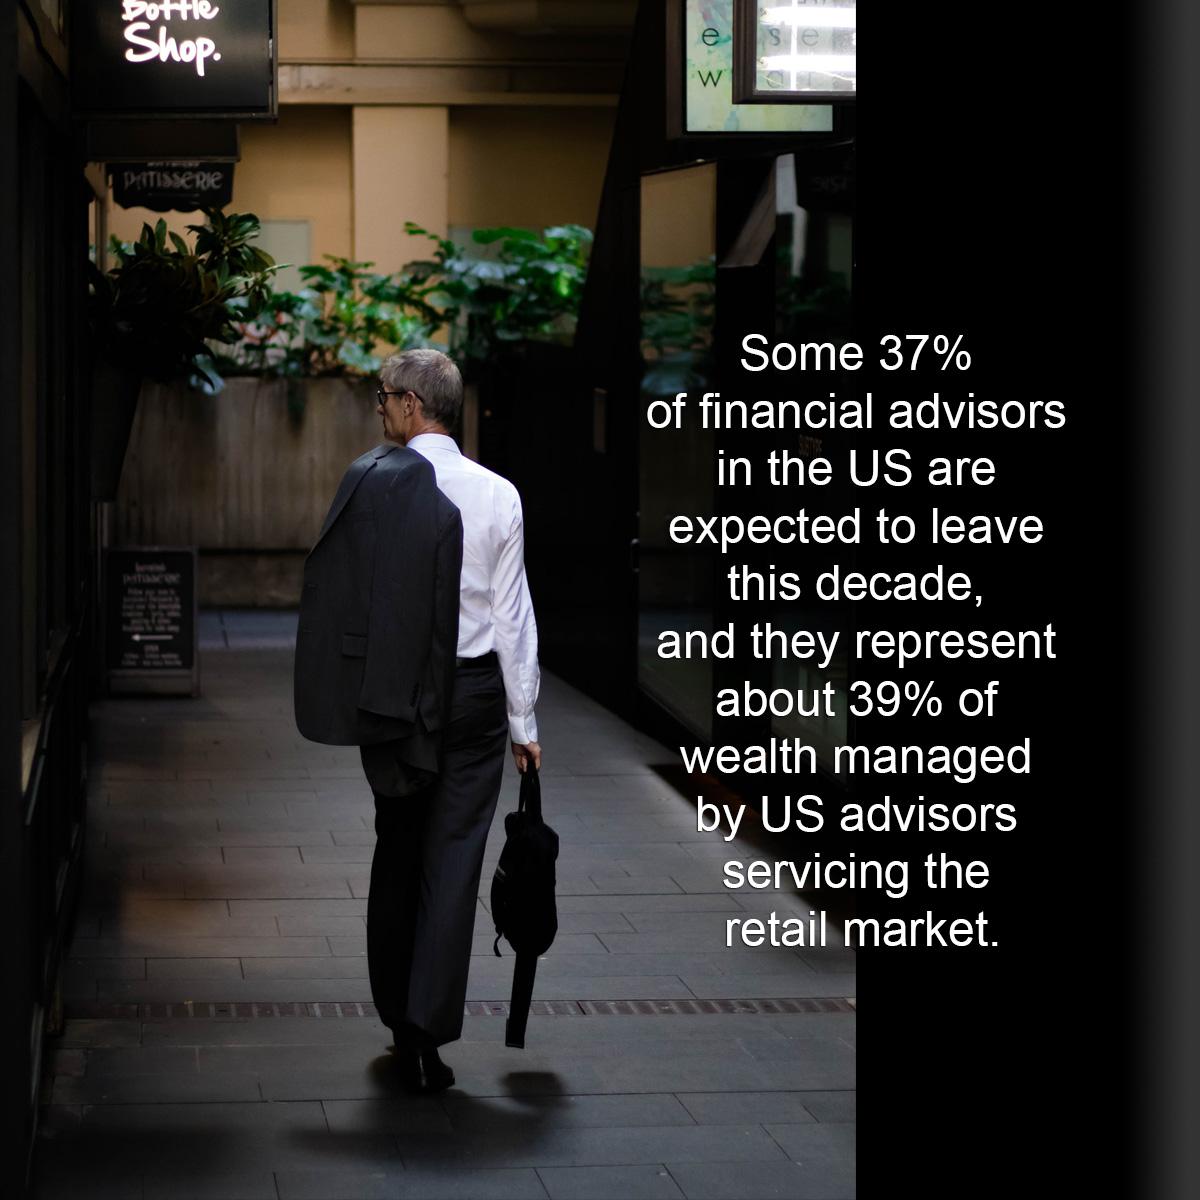 Finanxial Advisors leaving the market